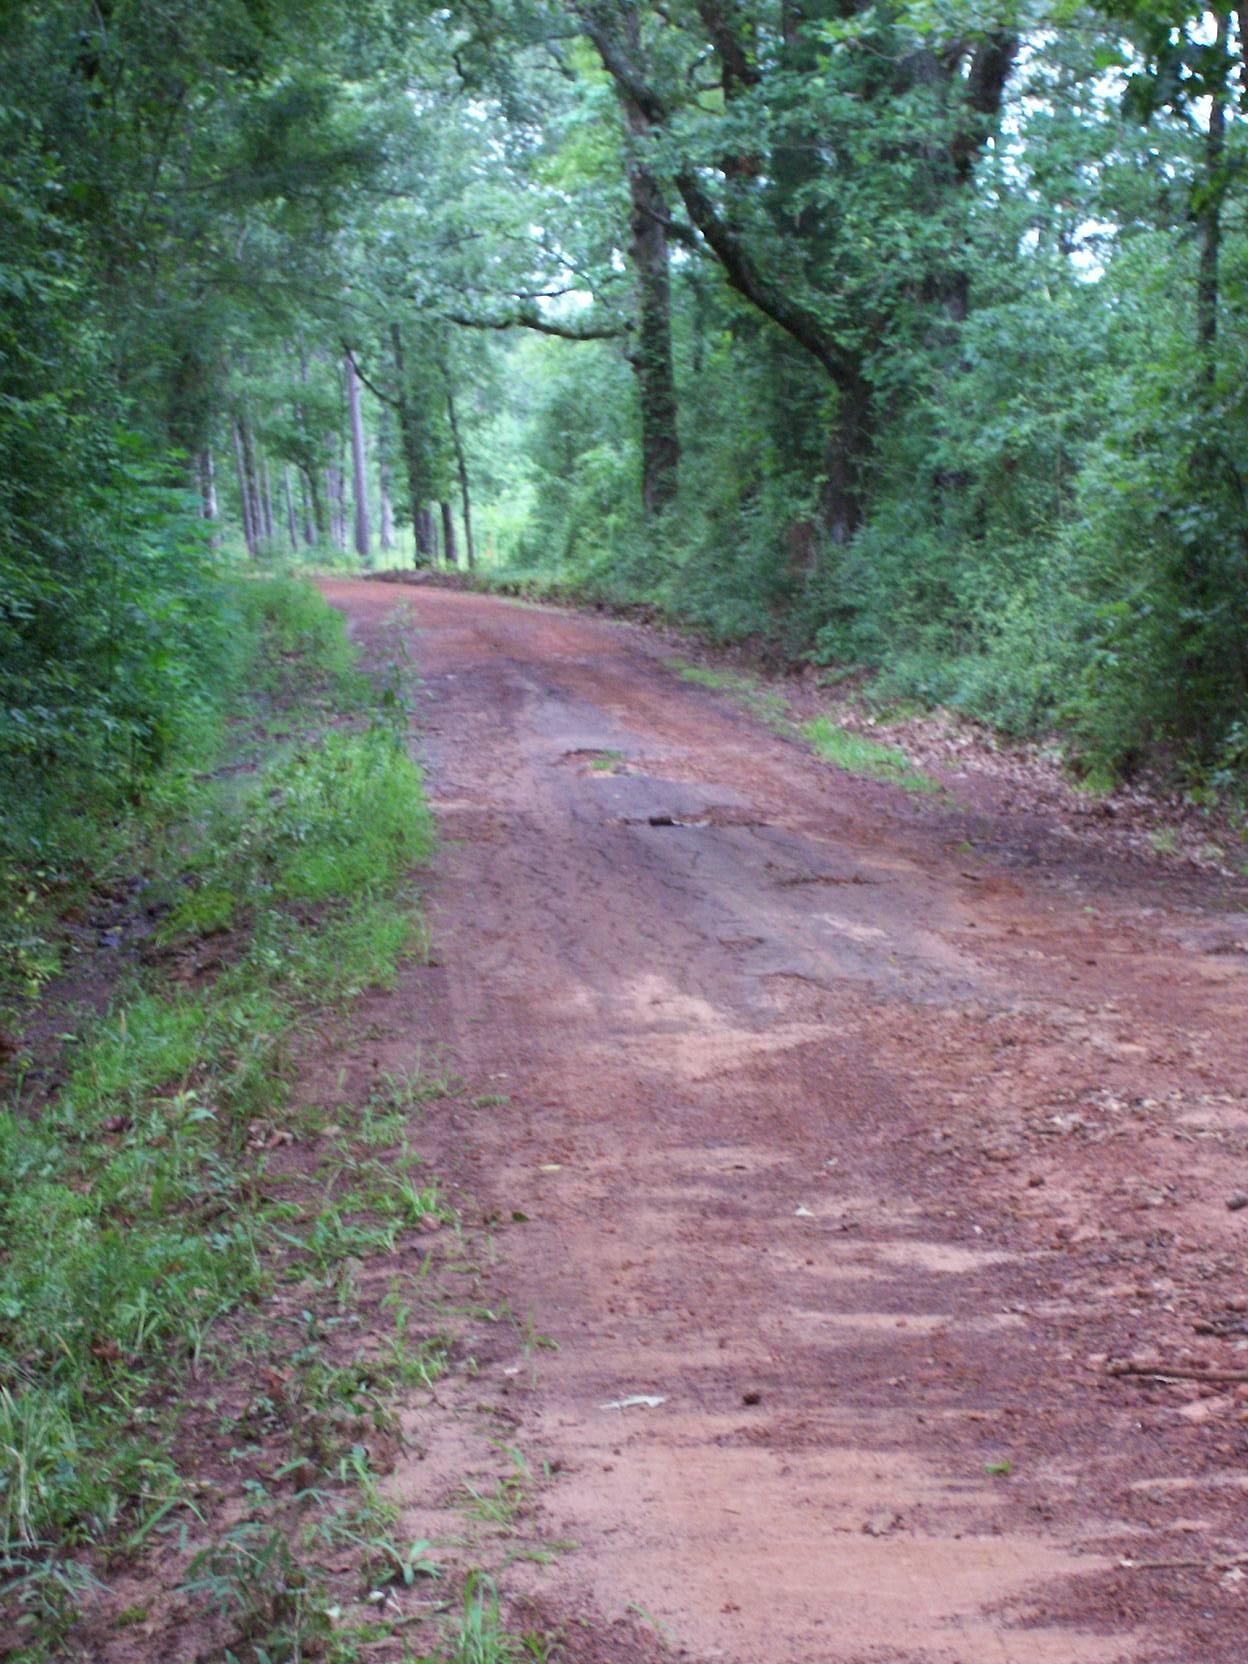 County roads